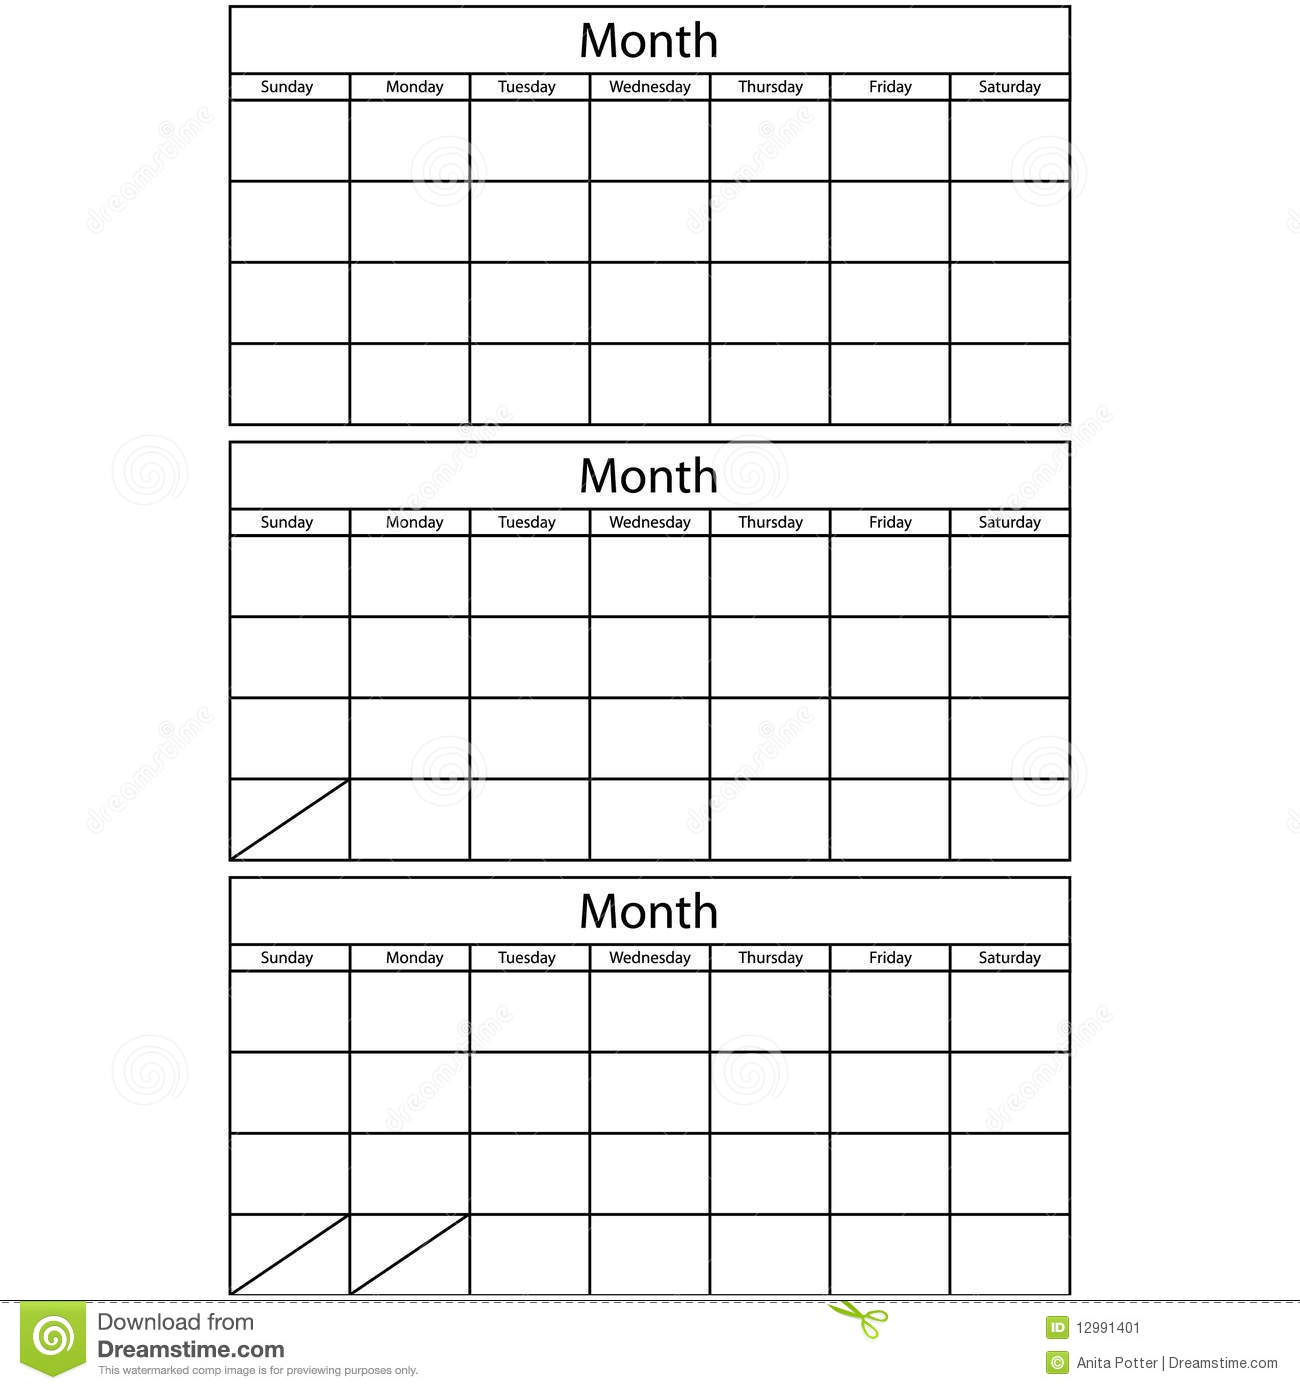 Crush 3 Month Printable Calendars | Kenzi's Blog